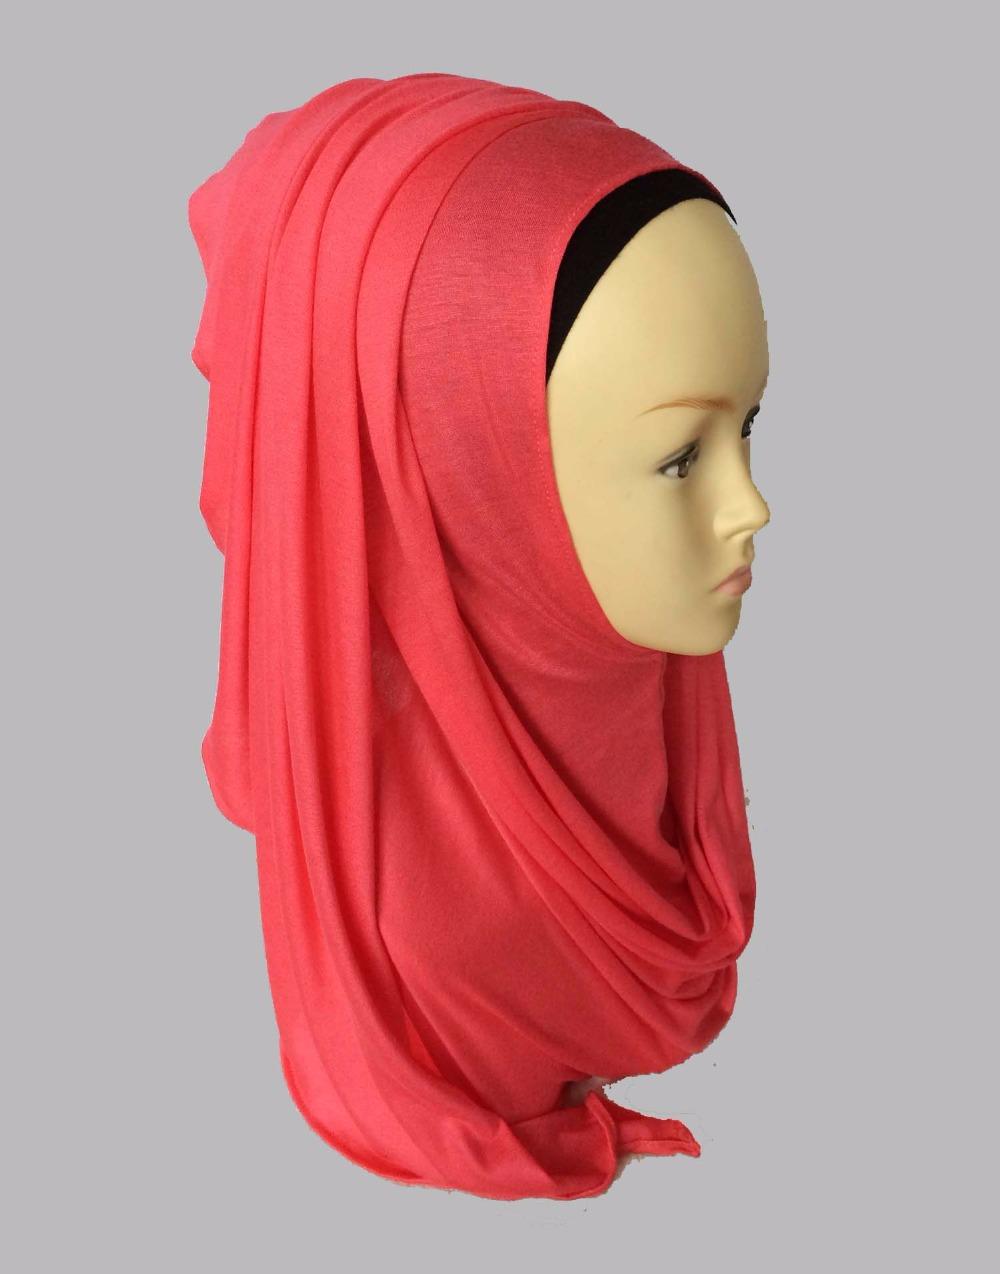 Aliexpress.com : Buy Jersey instant shawl hijab slip on ...